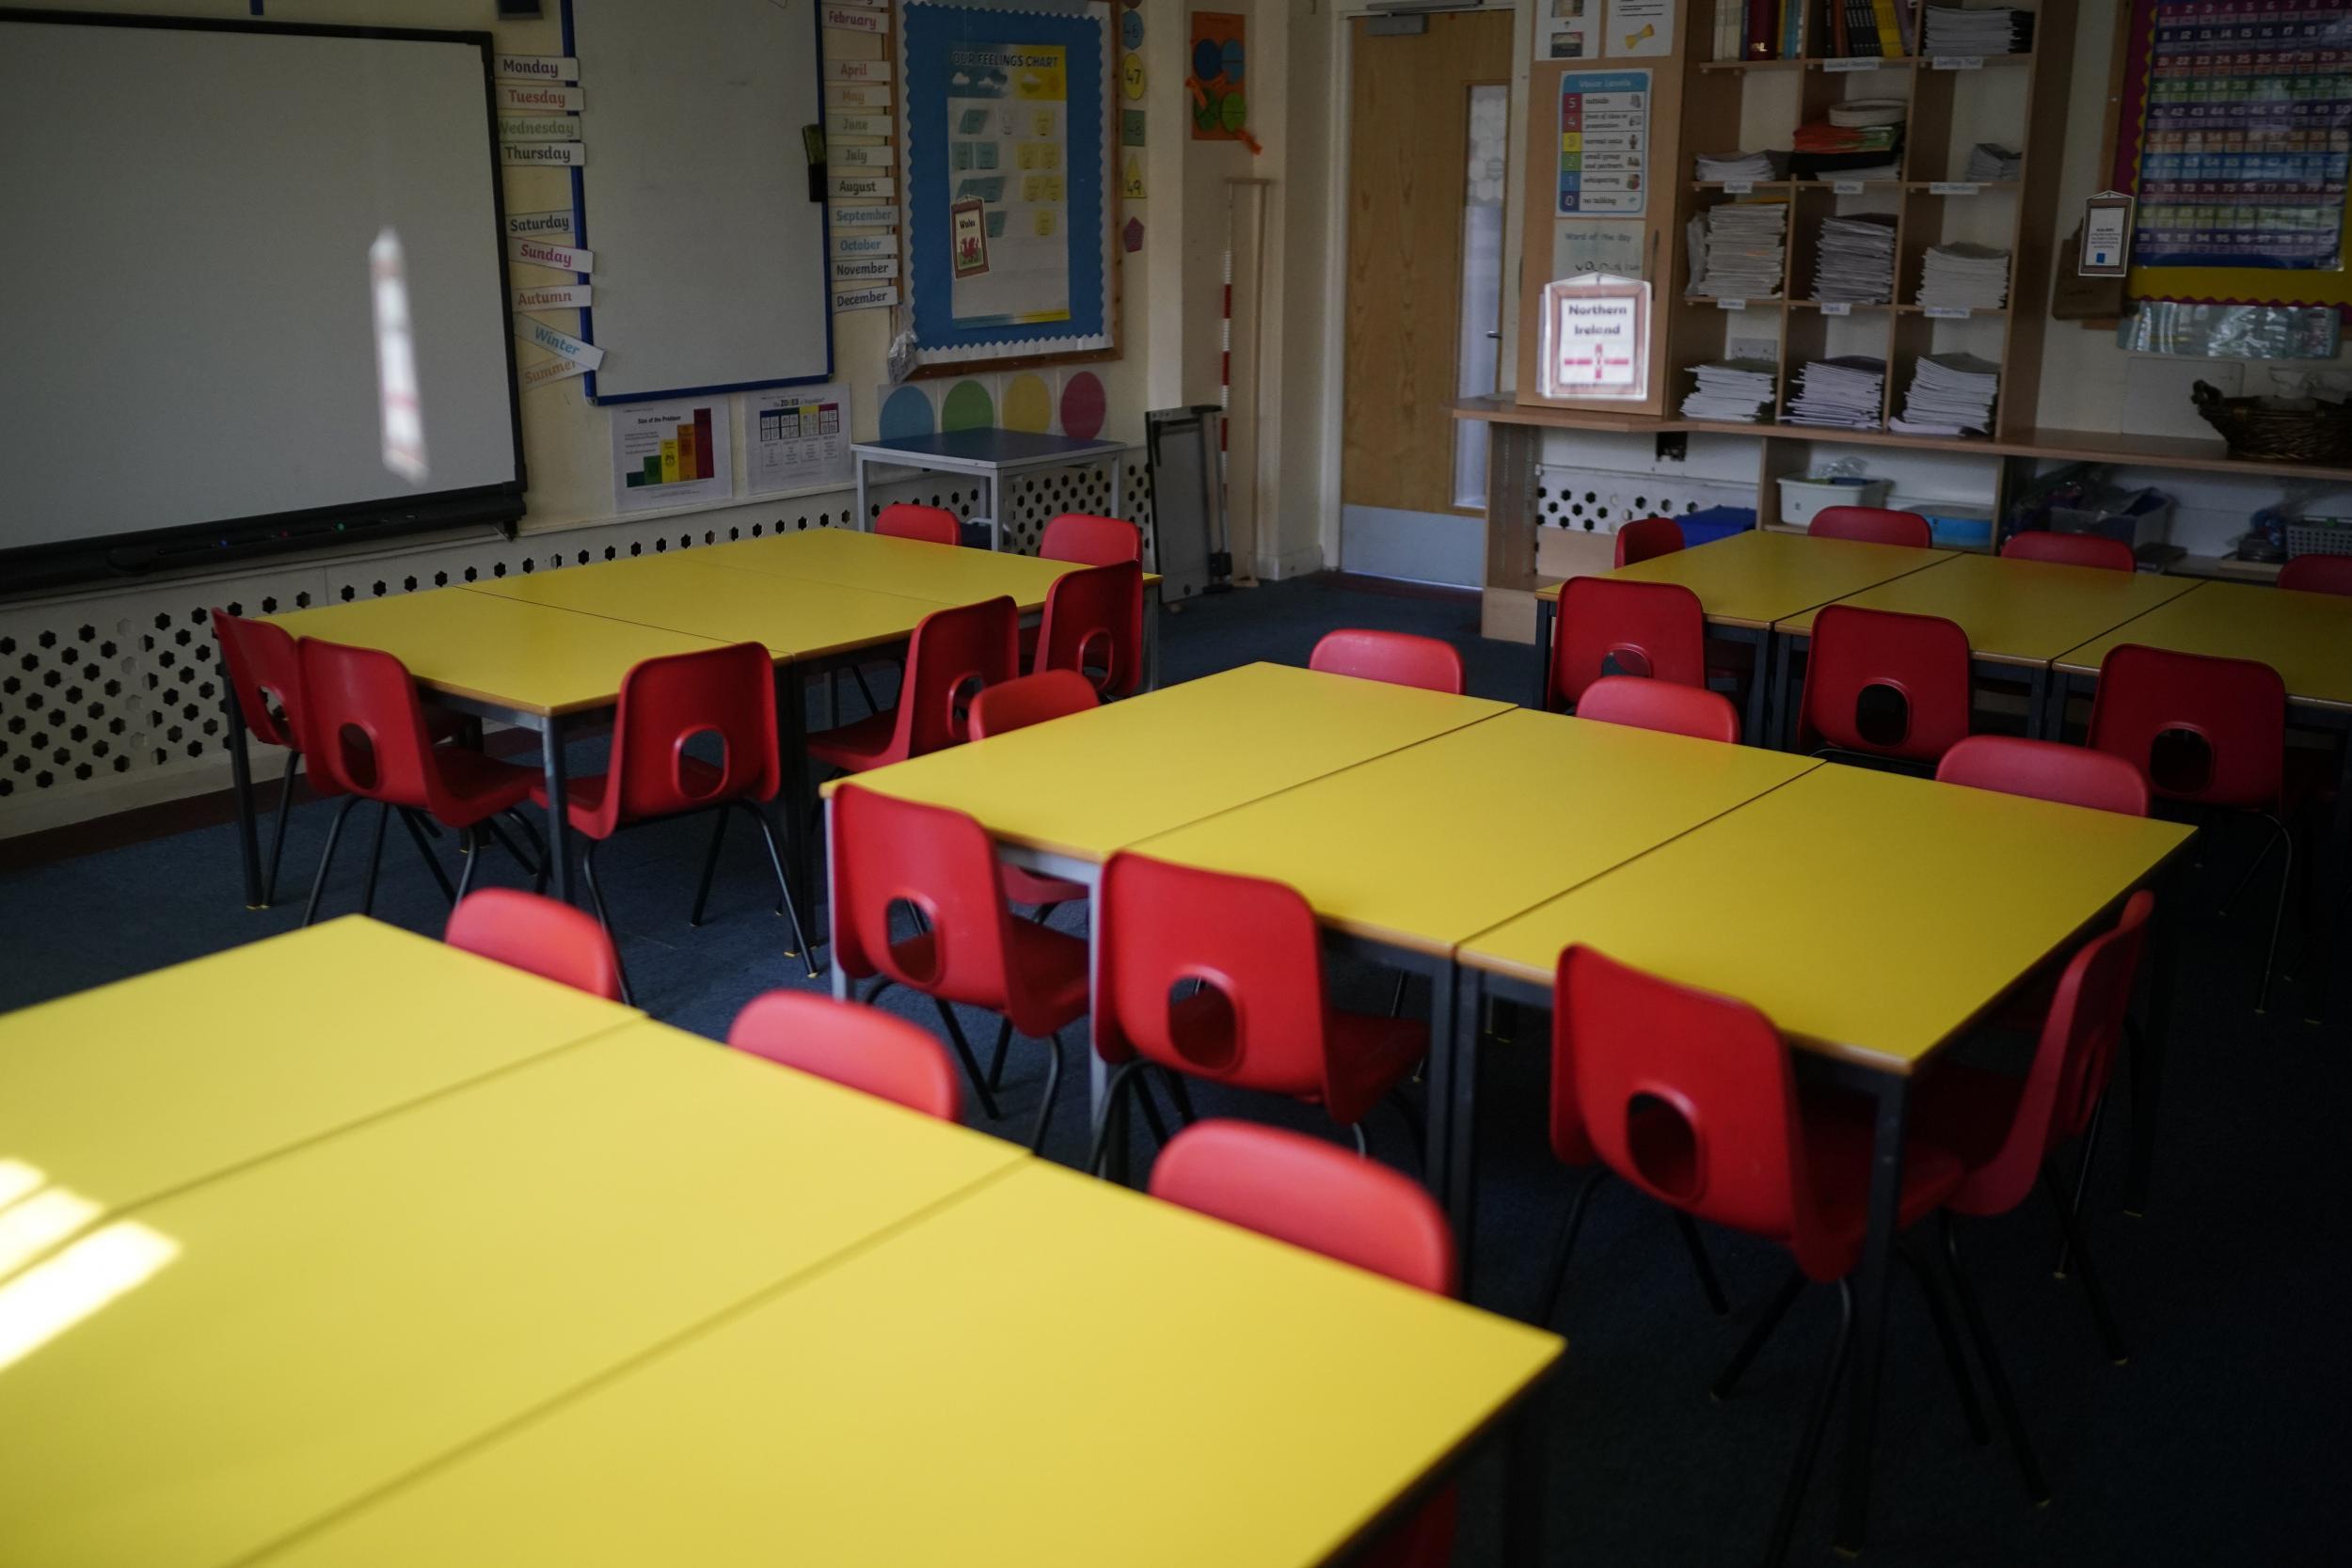 Coronavirus Is It Safe To Reopen Schools The Independent